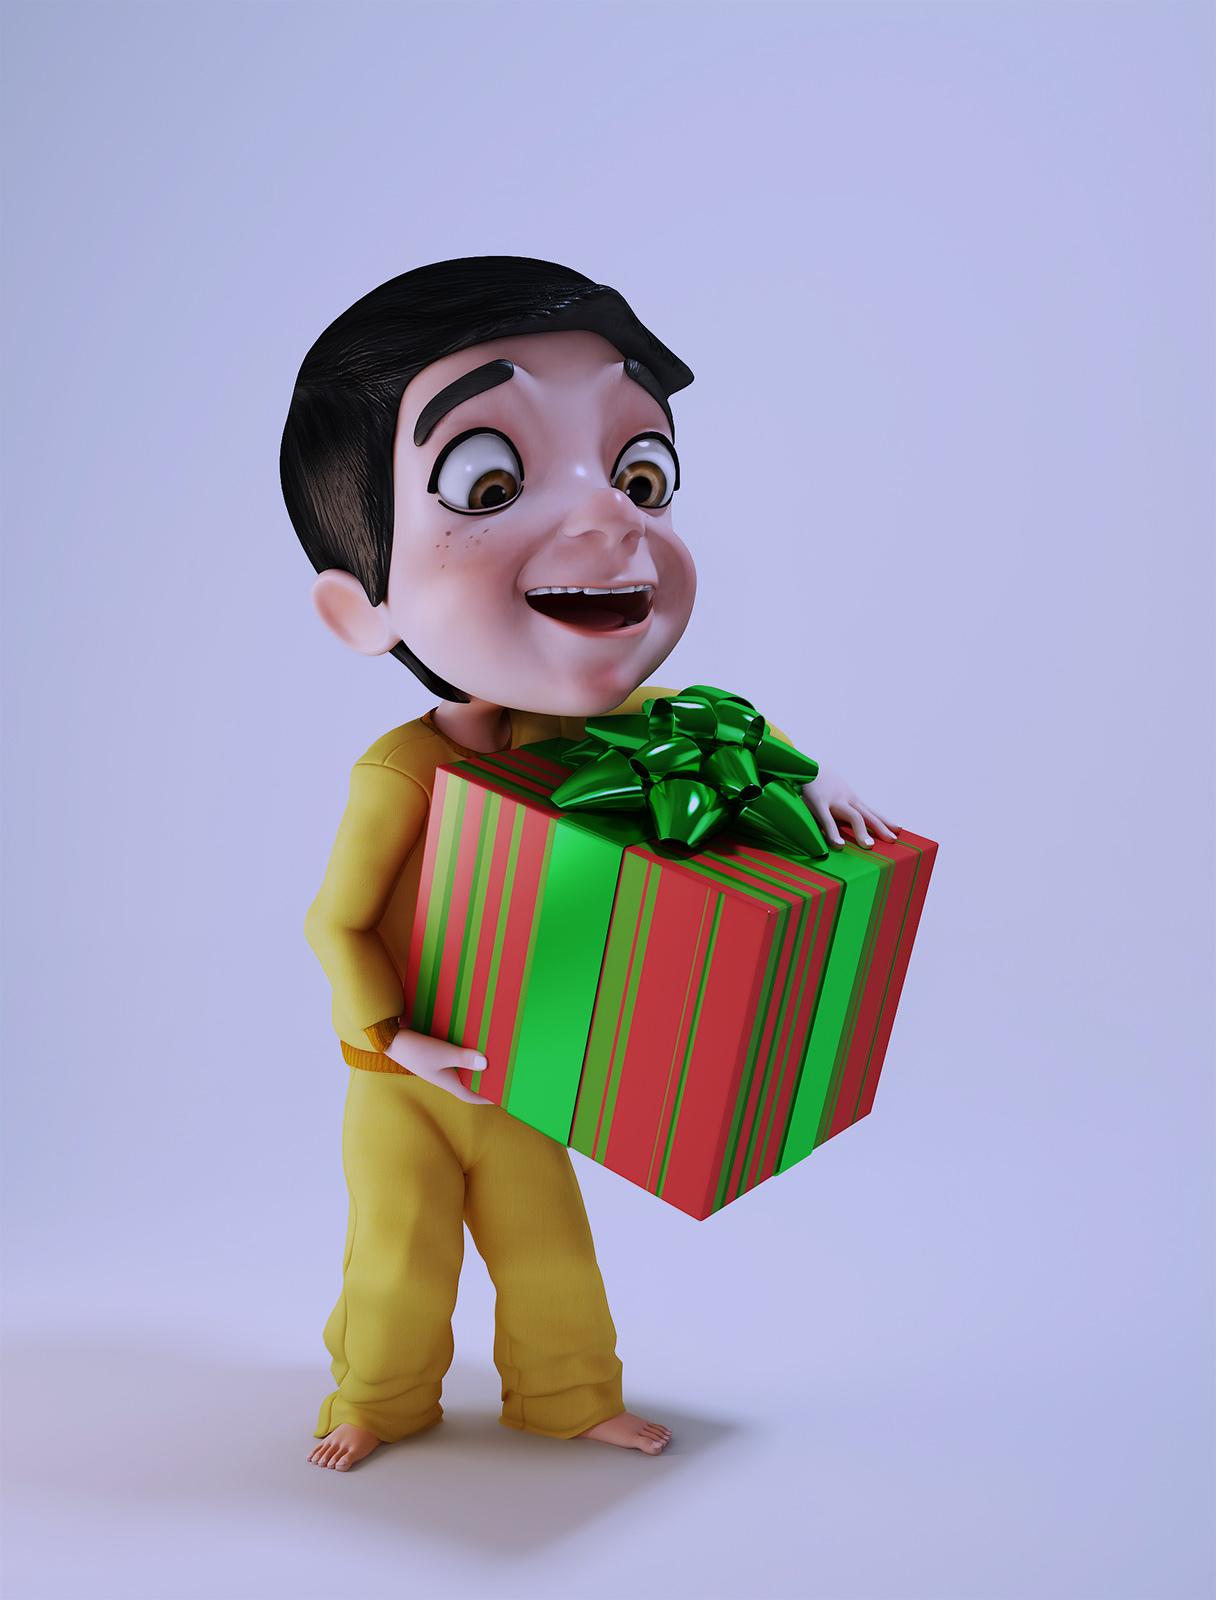 Jonamar my gift 1 216390d8 vsna